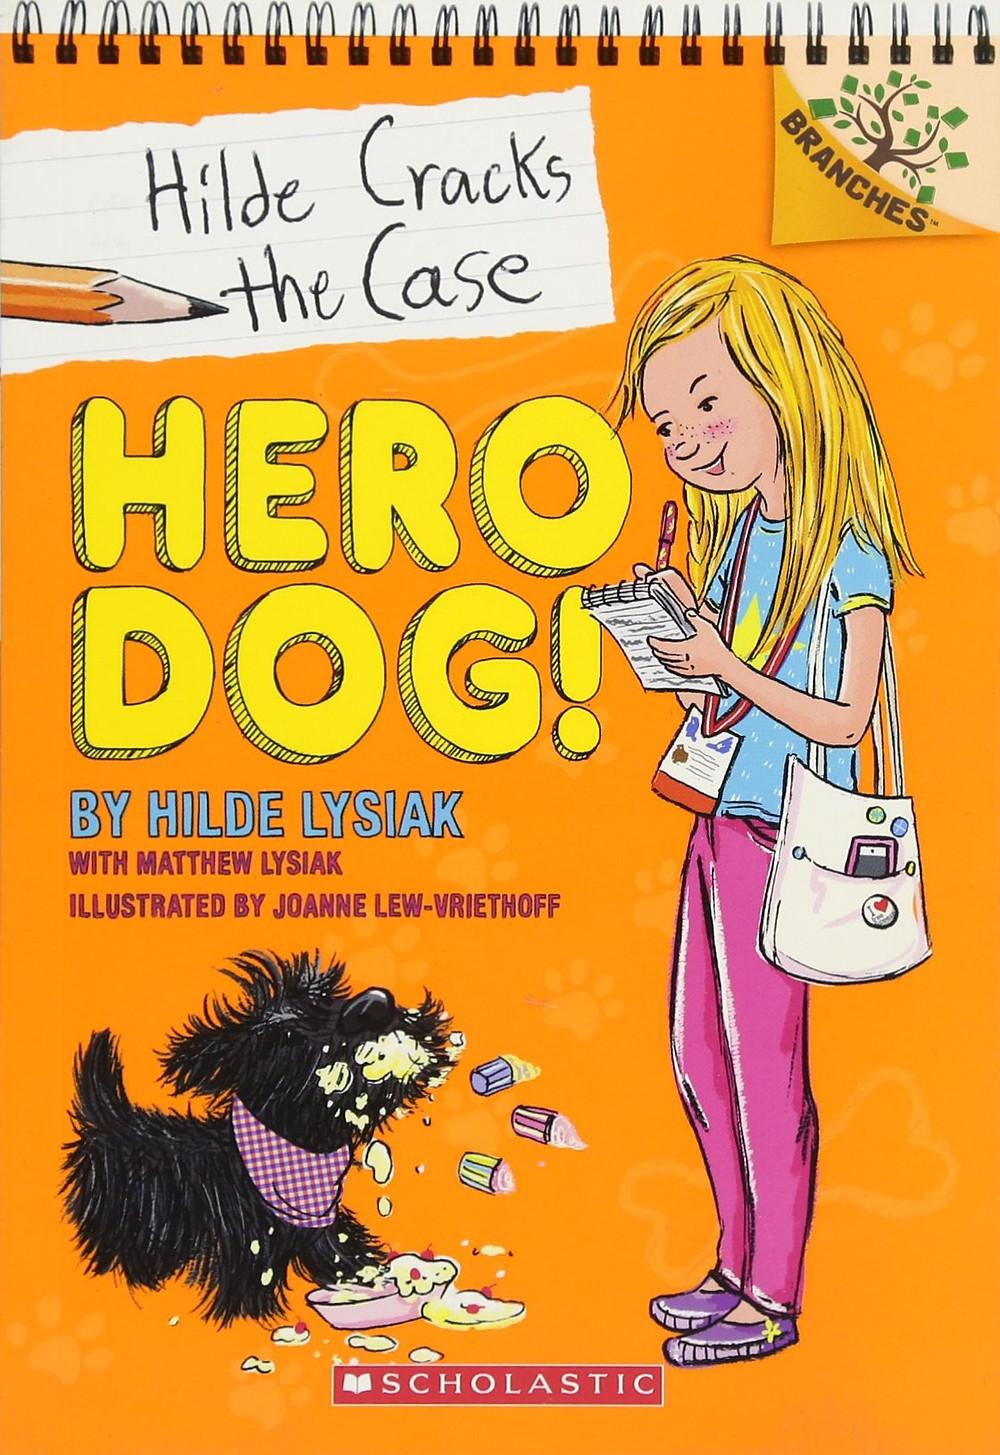 Hilde Lysiak's Hilde Cracks the Case, Book 1: Hero Dog!